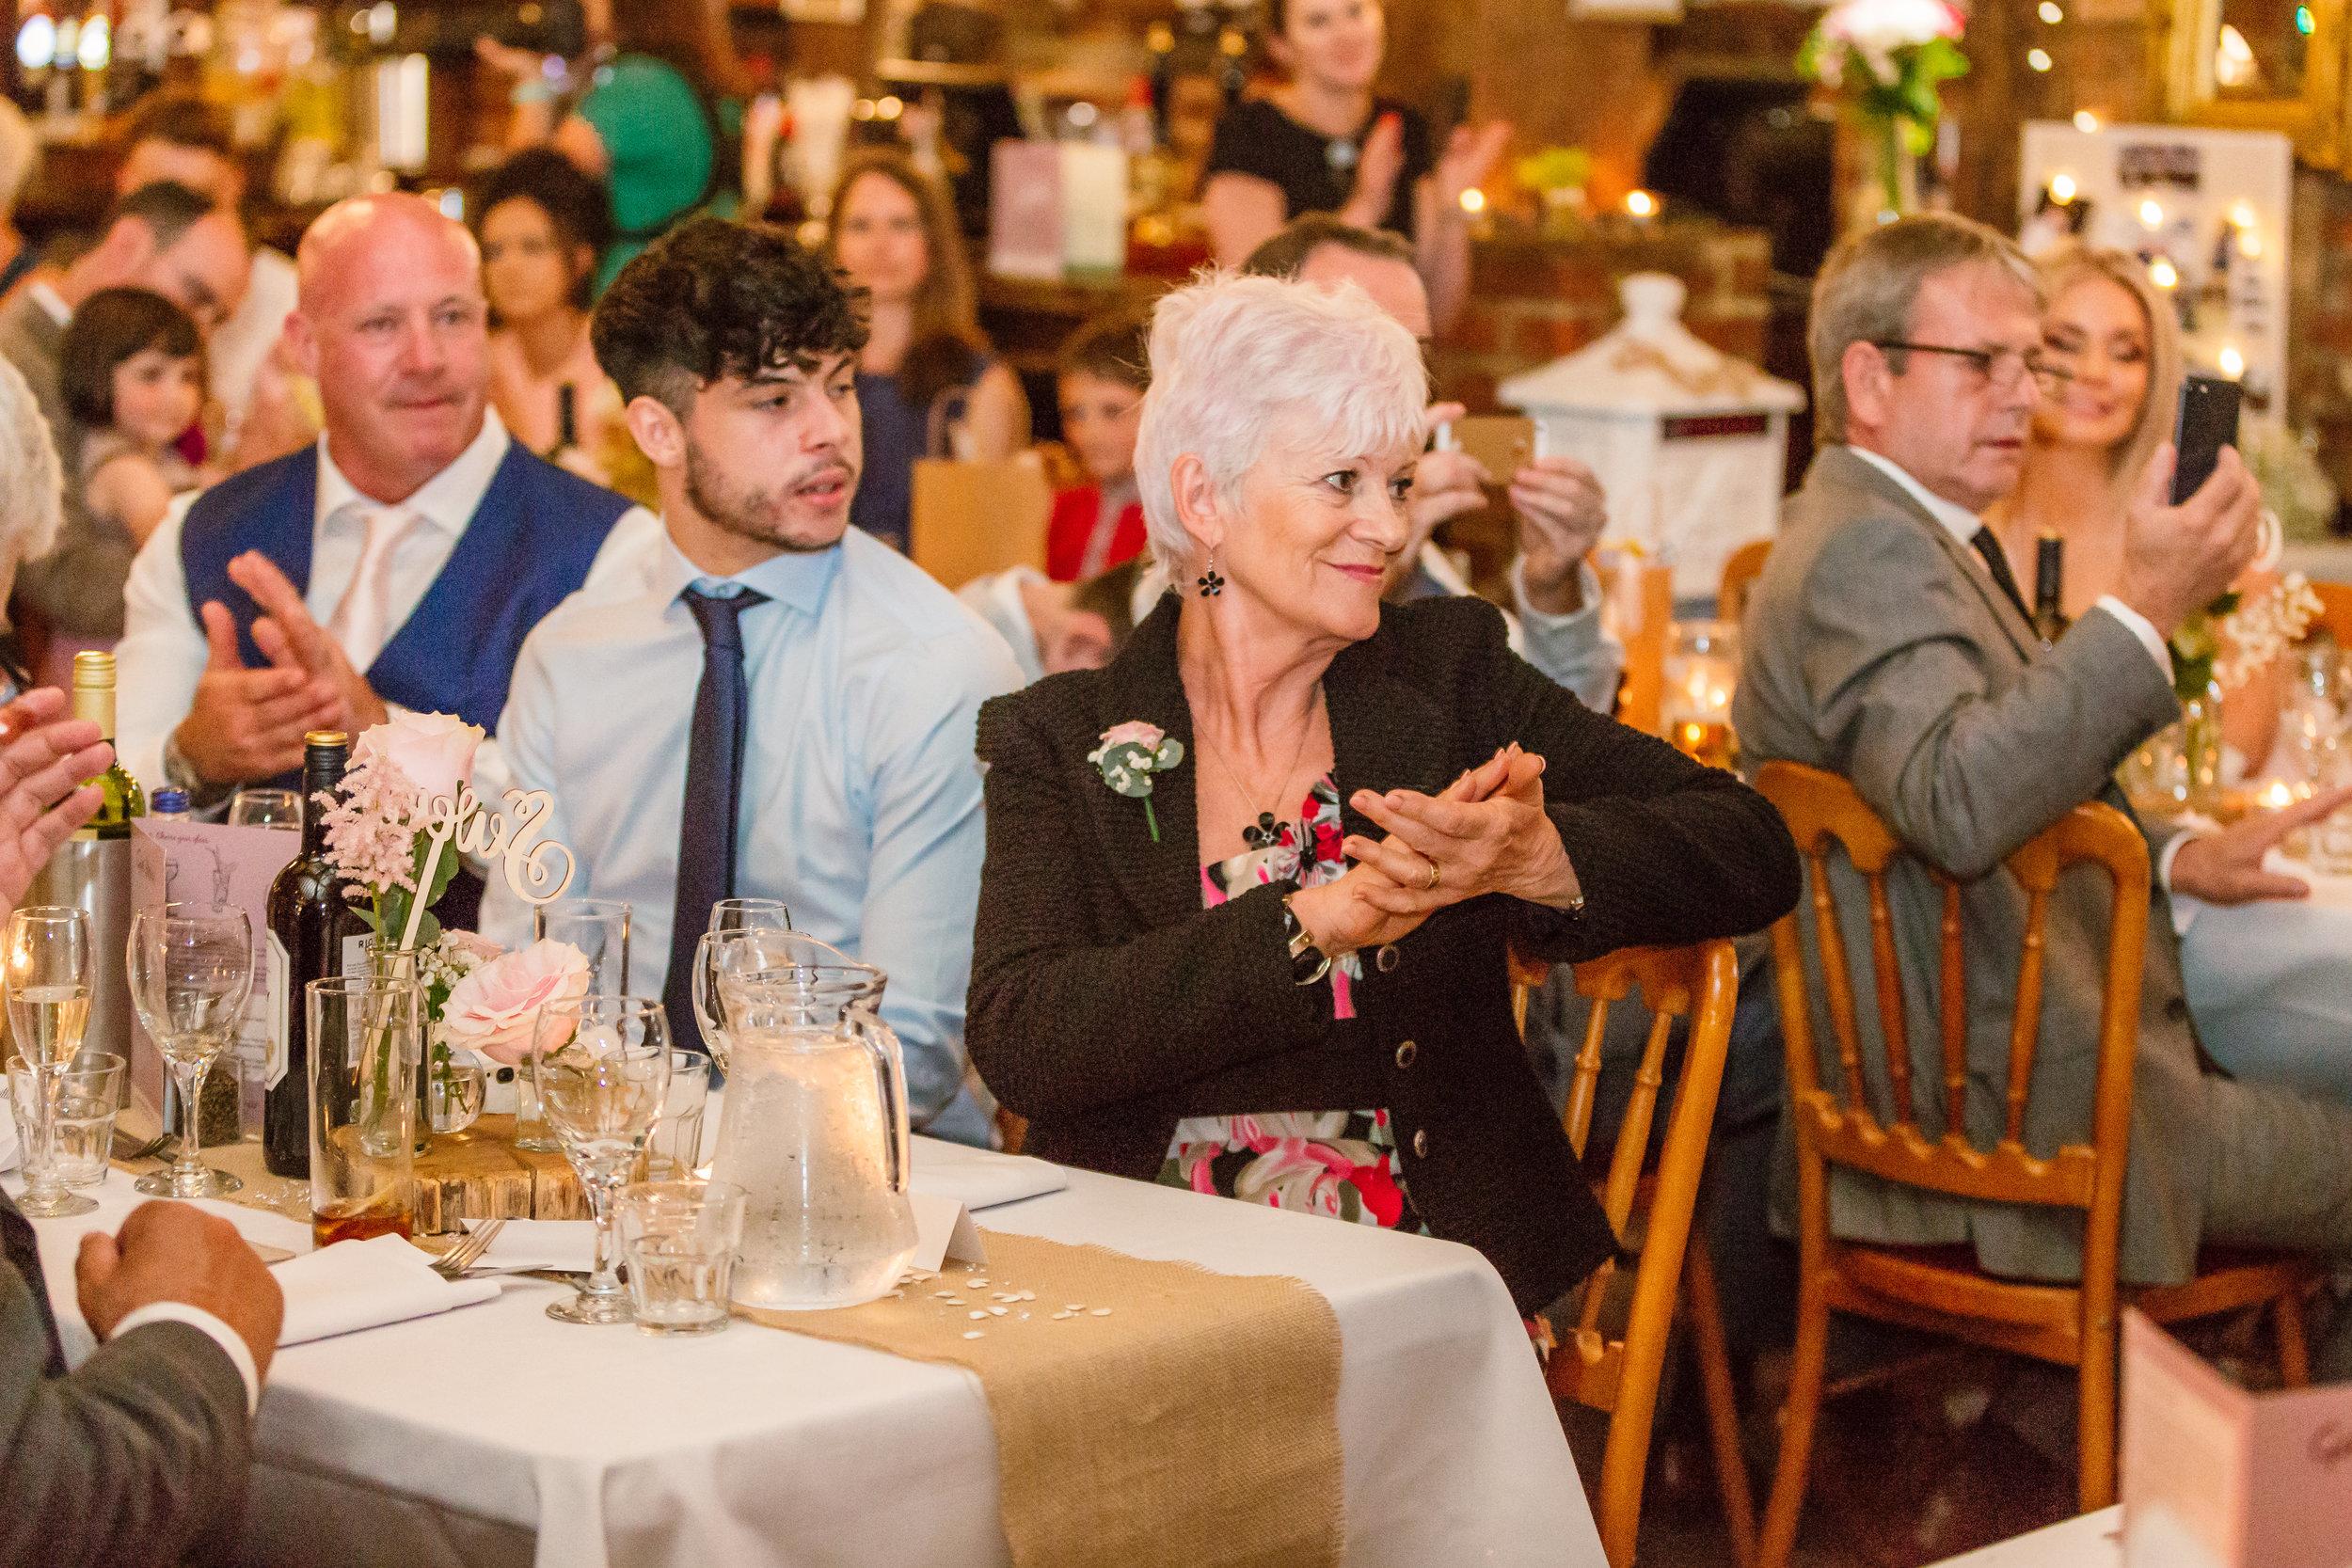 Sarah-Fishlock-Photography : Hampshire-wedding-photographer-hampshire : fleet-wedding-photographer-fleet : Meade-Hall-Wedding-Photographer : Meade-Hall-Wedding-Photos-833.jpg